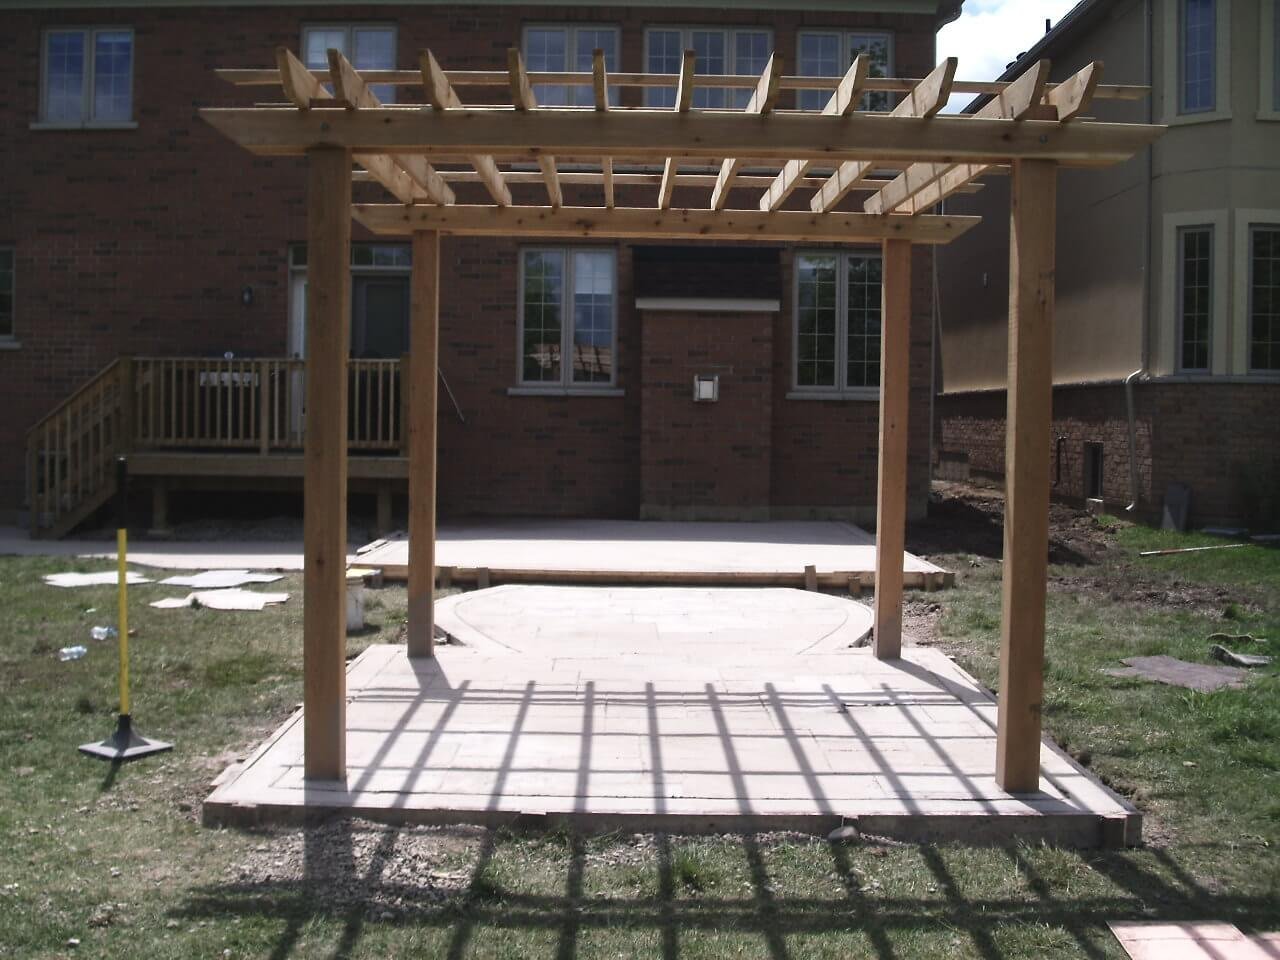 Decorative-Concrete-Construction-Contractor-Toronto-Pergola-Rd-20